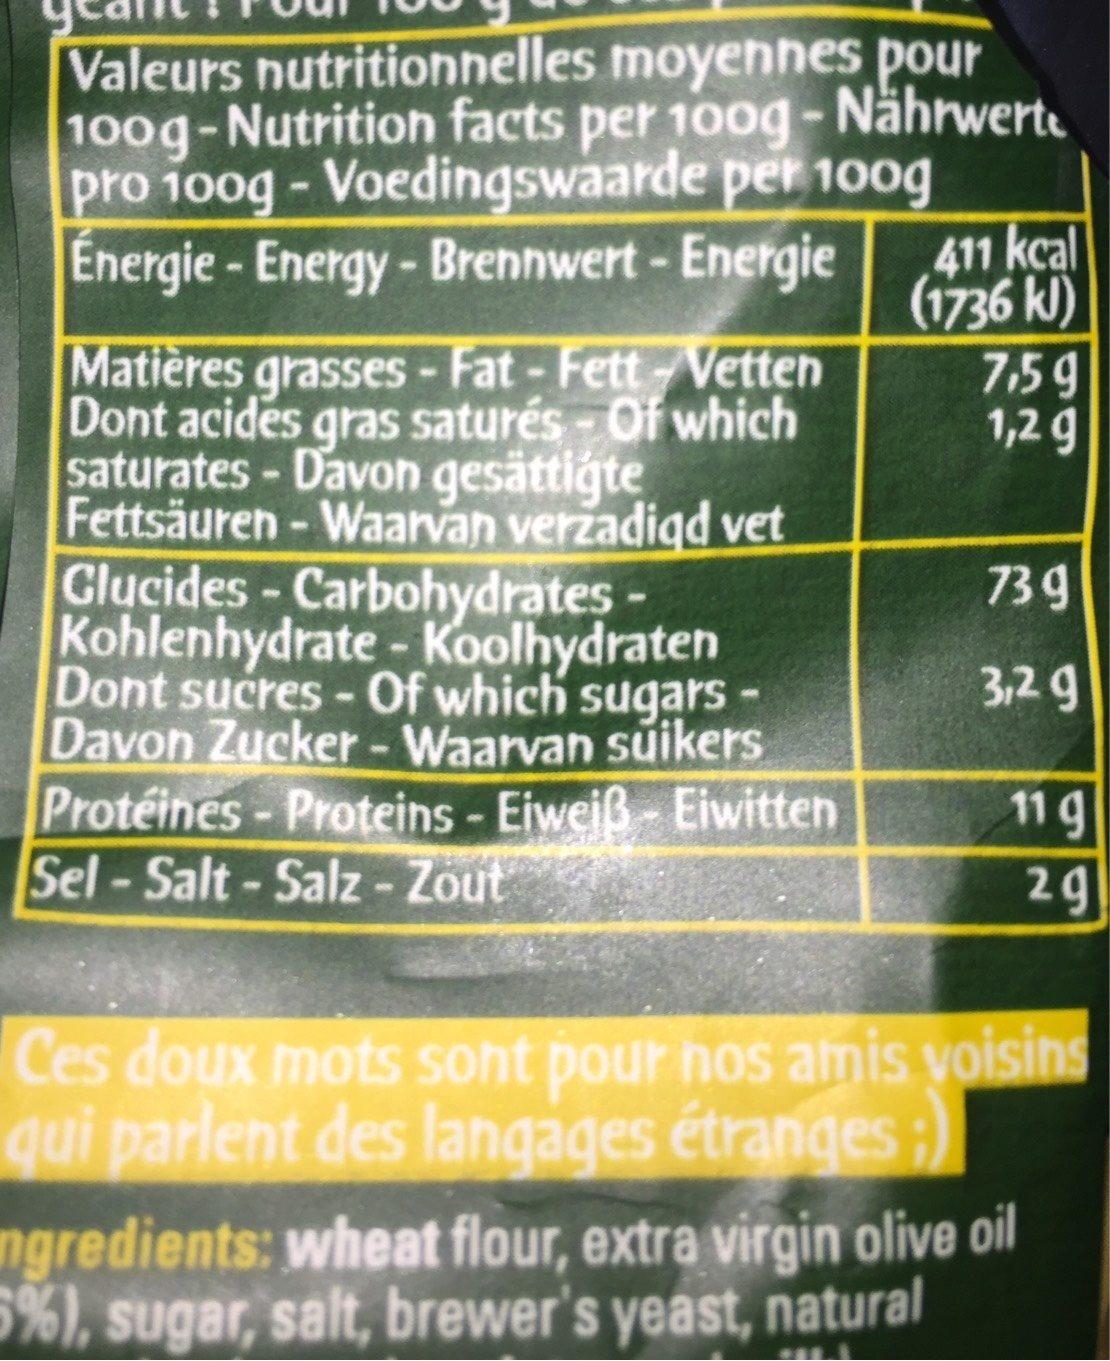 Pitas Huile D'olive Pointe De Sel - Nutrition facts